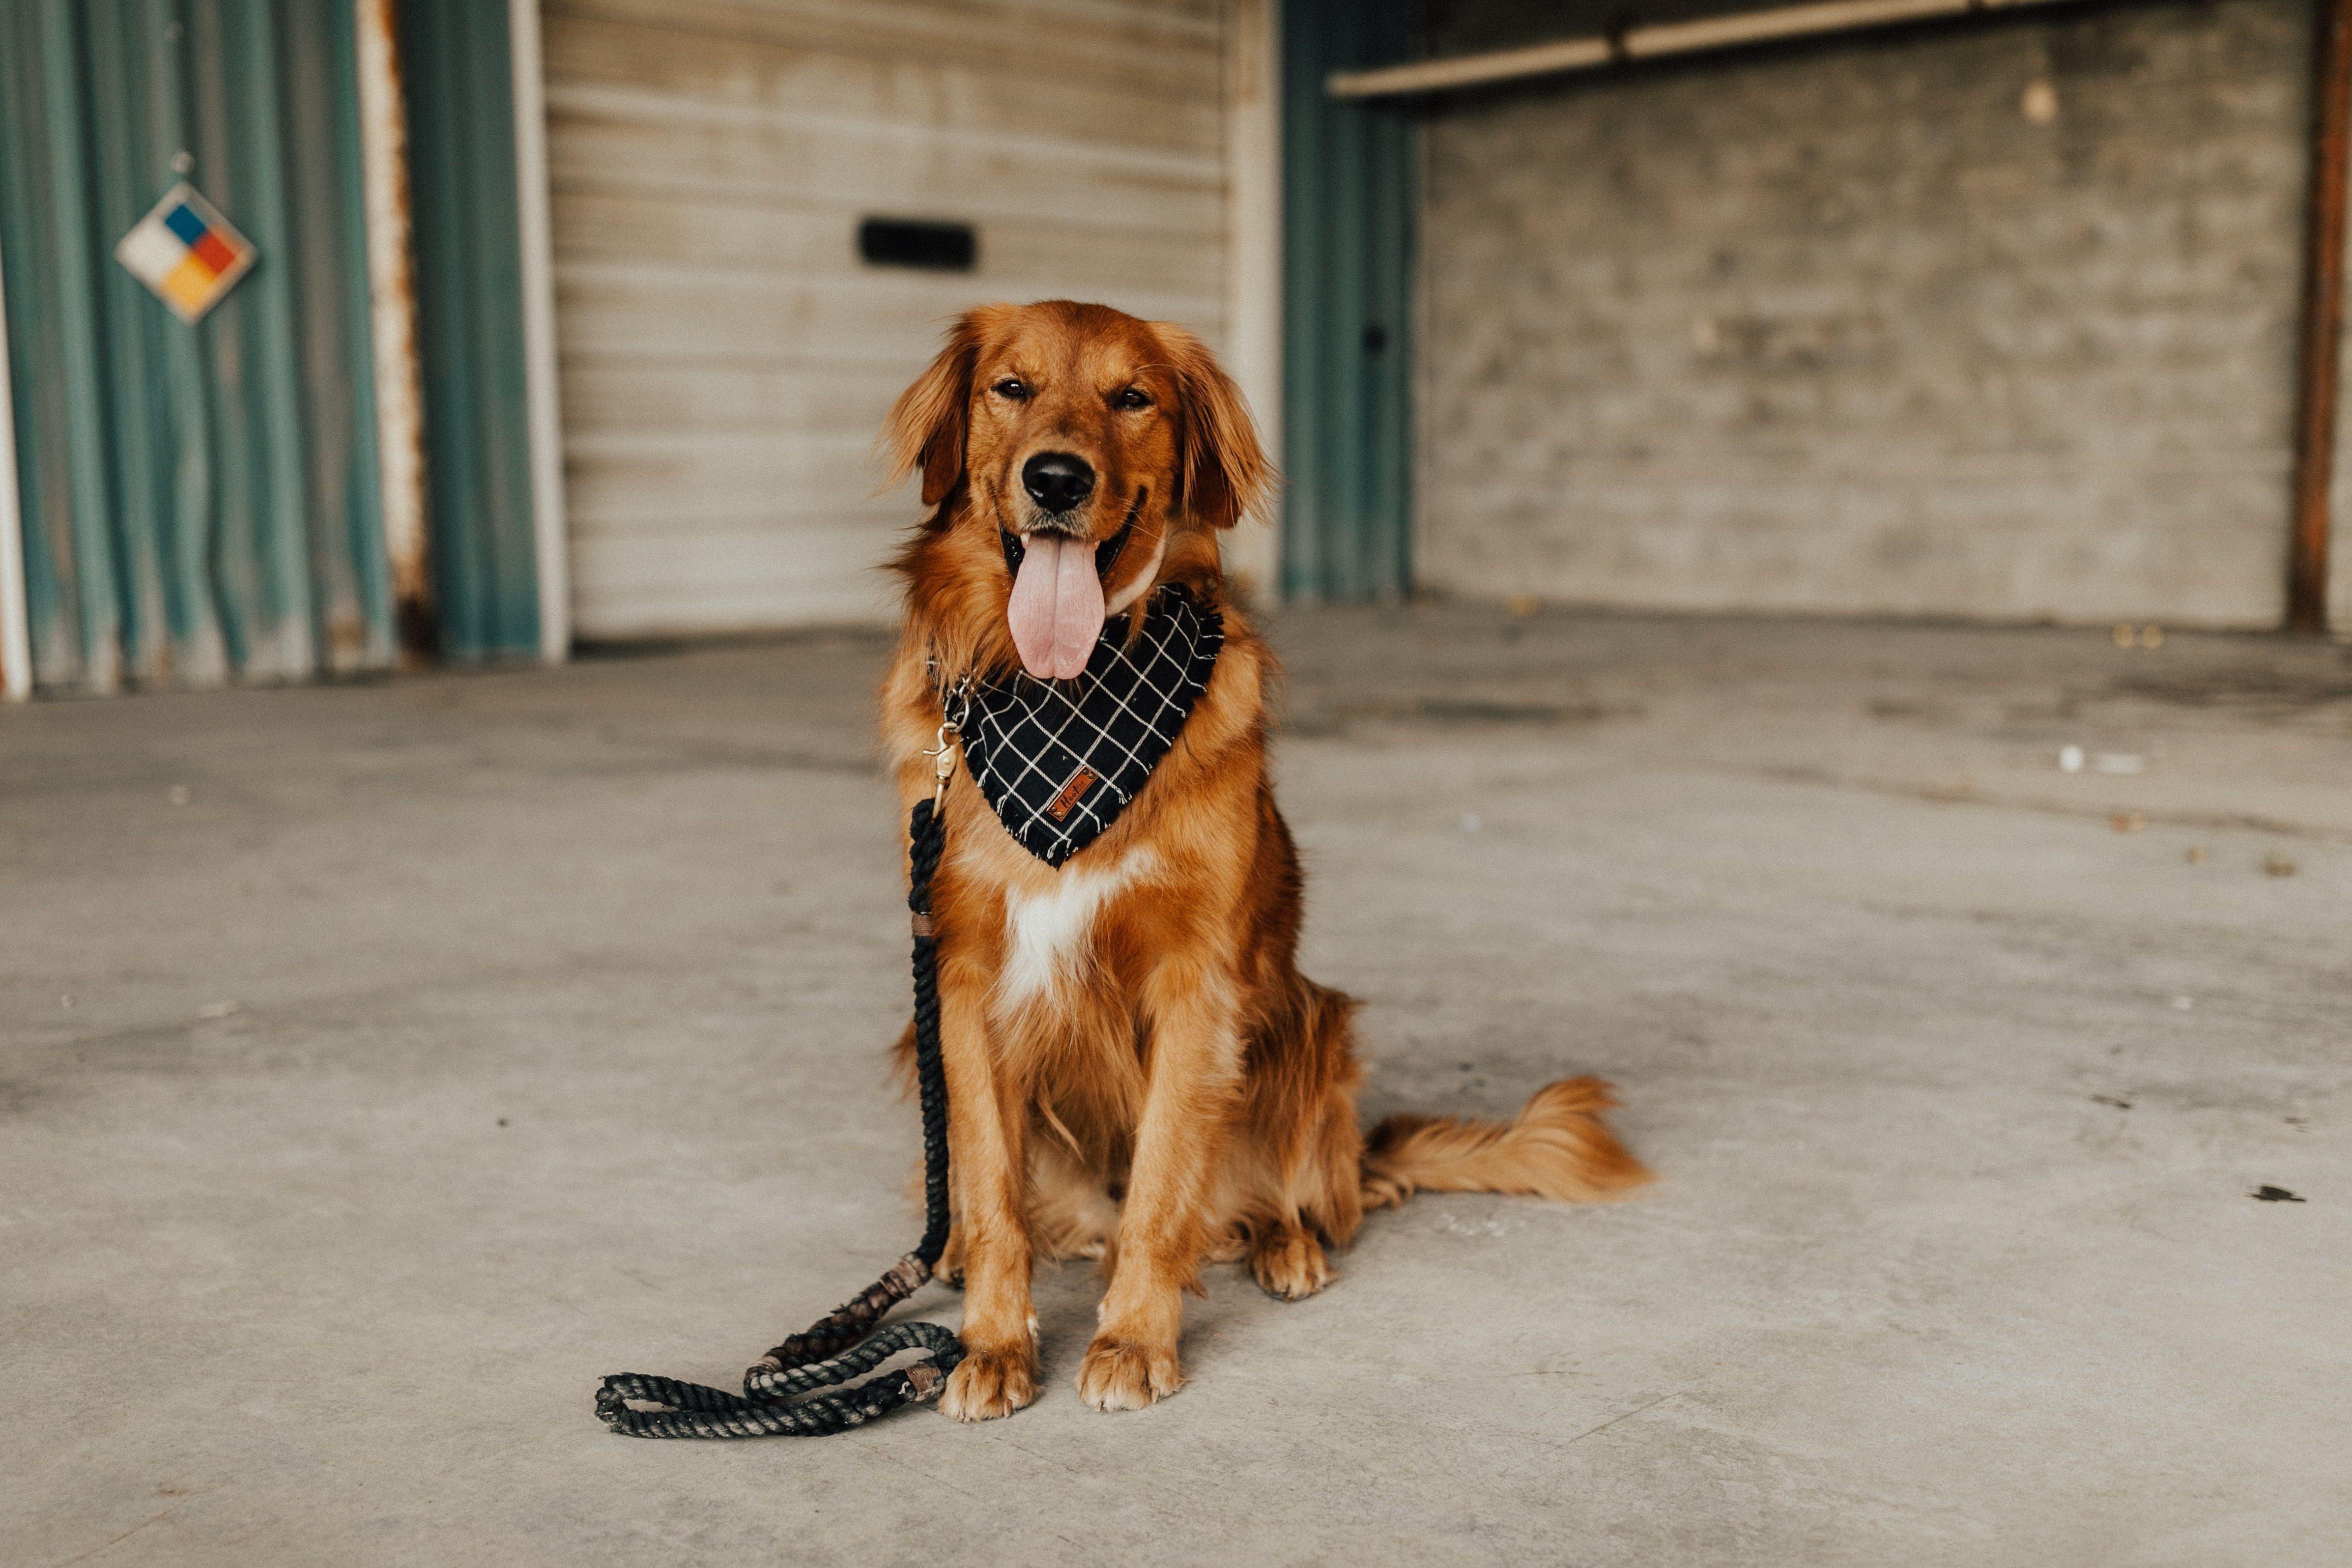 Hoot And Co Pet Bandana Dog Bandana Plaid Bandana Frayed Dog Bandana Pet Lover Gift Scarf Bandana Set Ma Dog Supplies Online Dog Store Pet Accessories